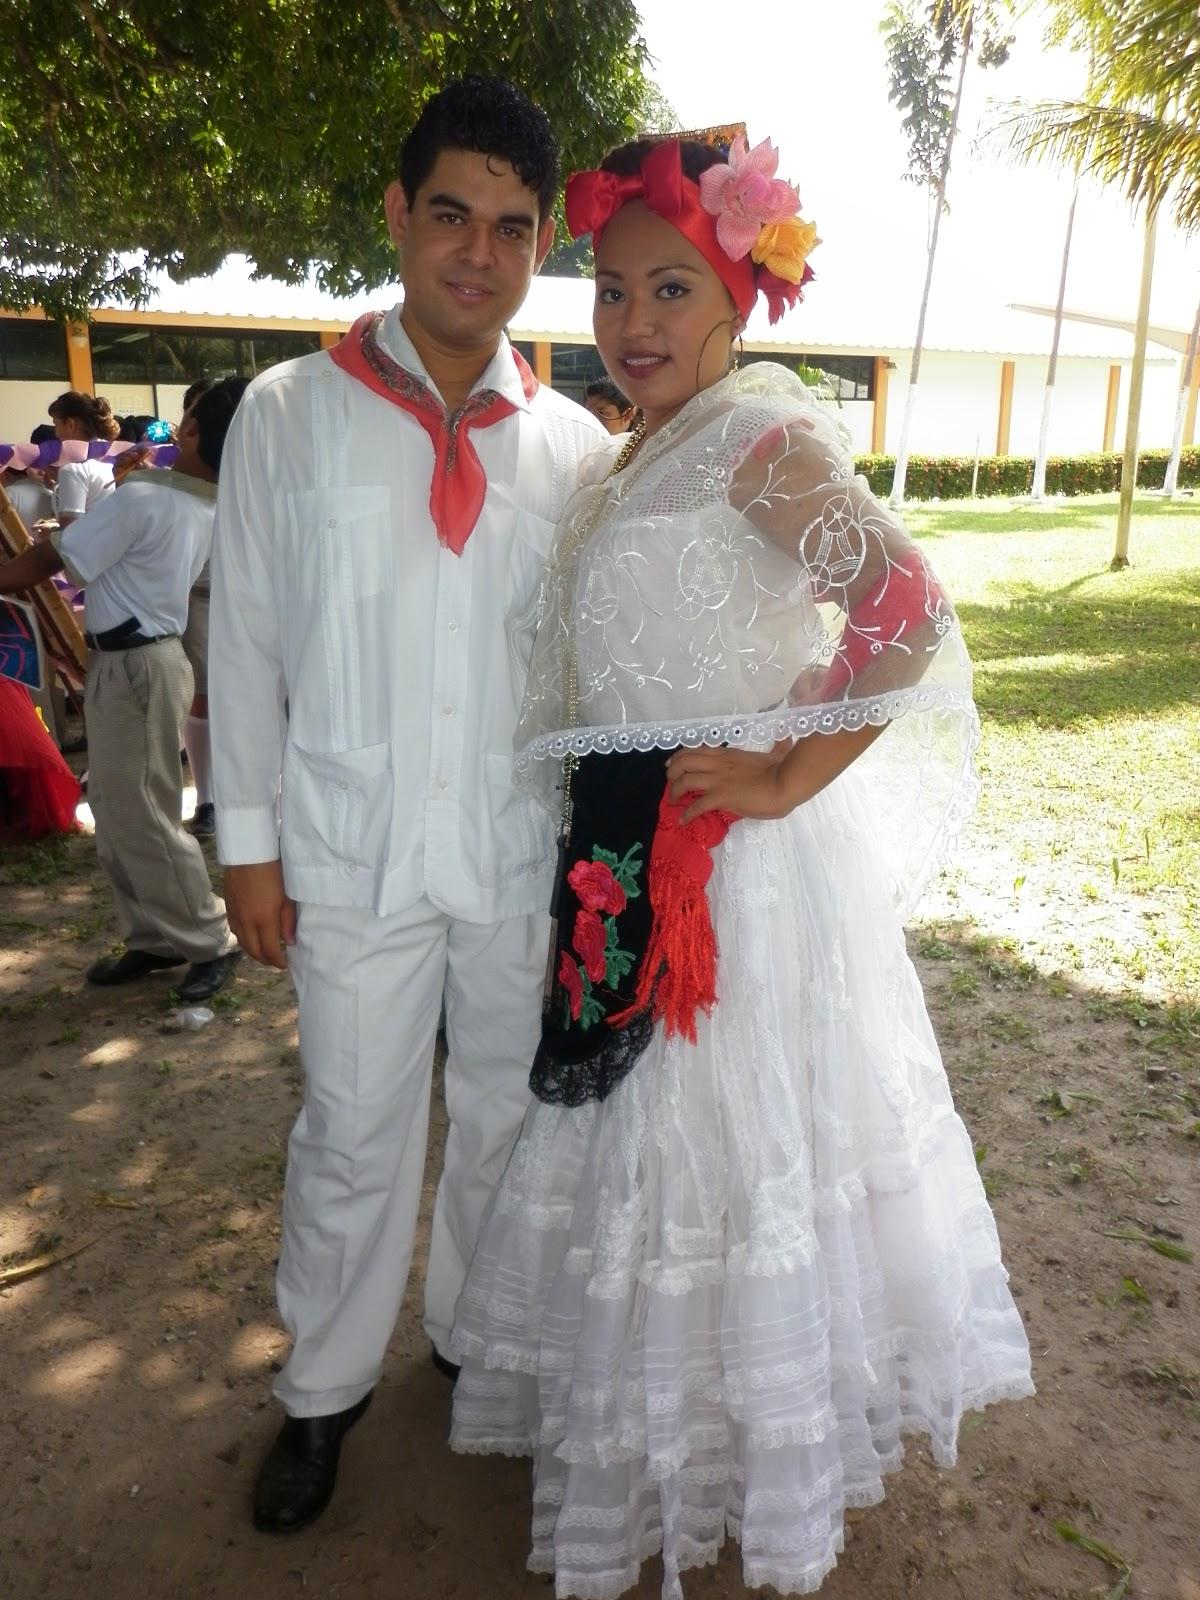 Santa marta de ortigueira online dating